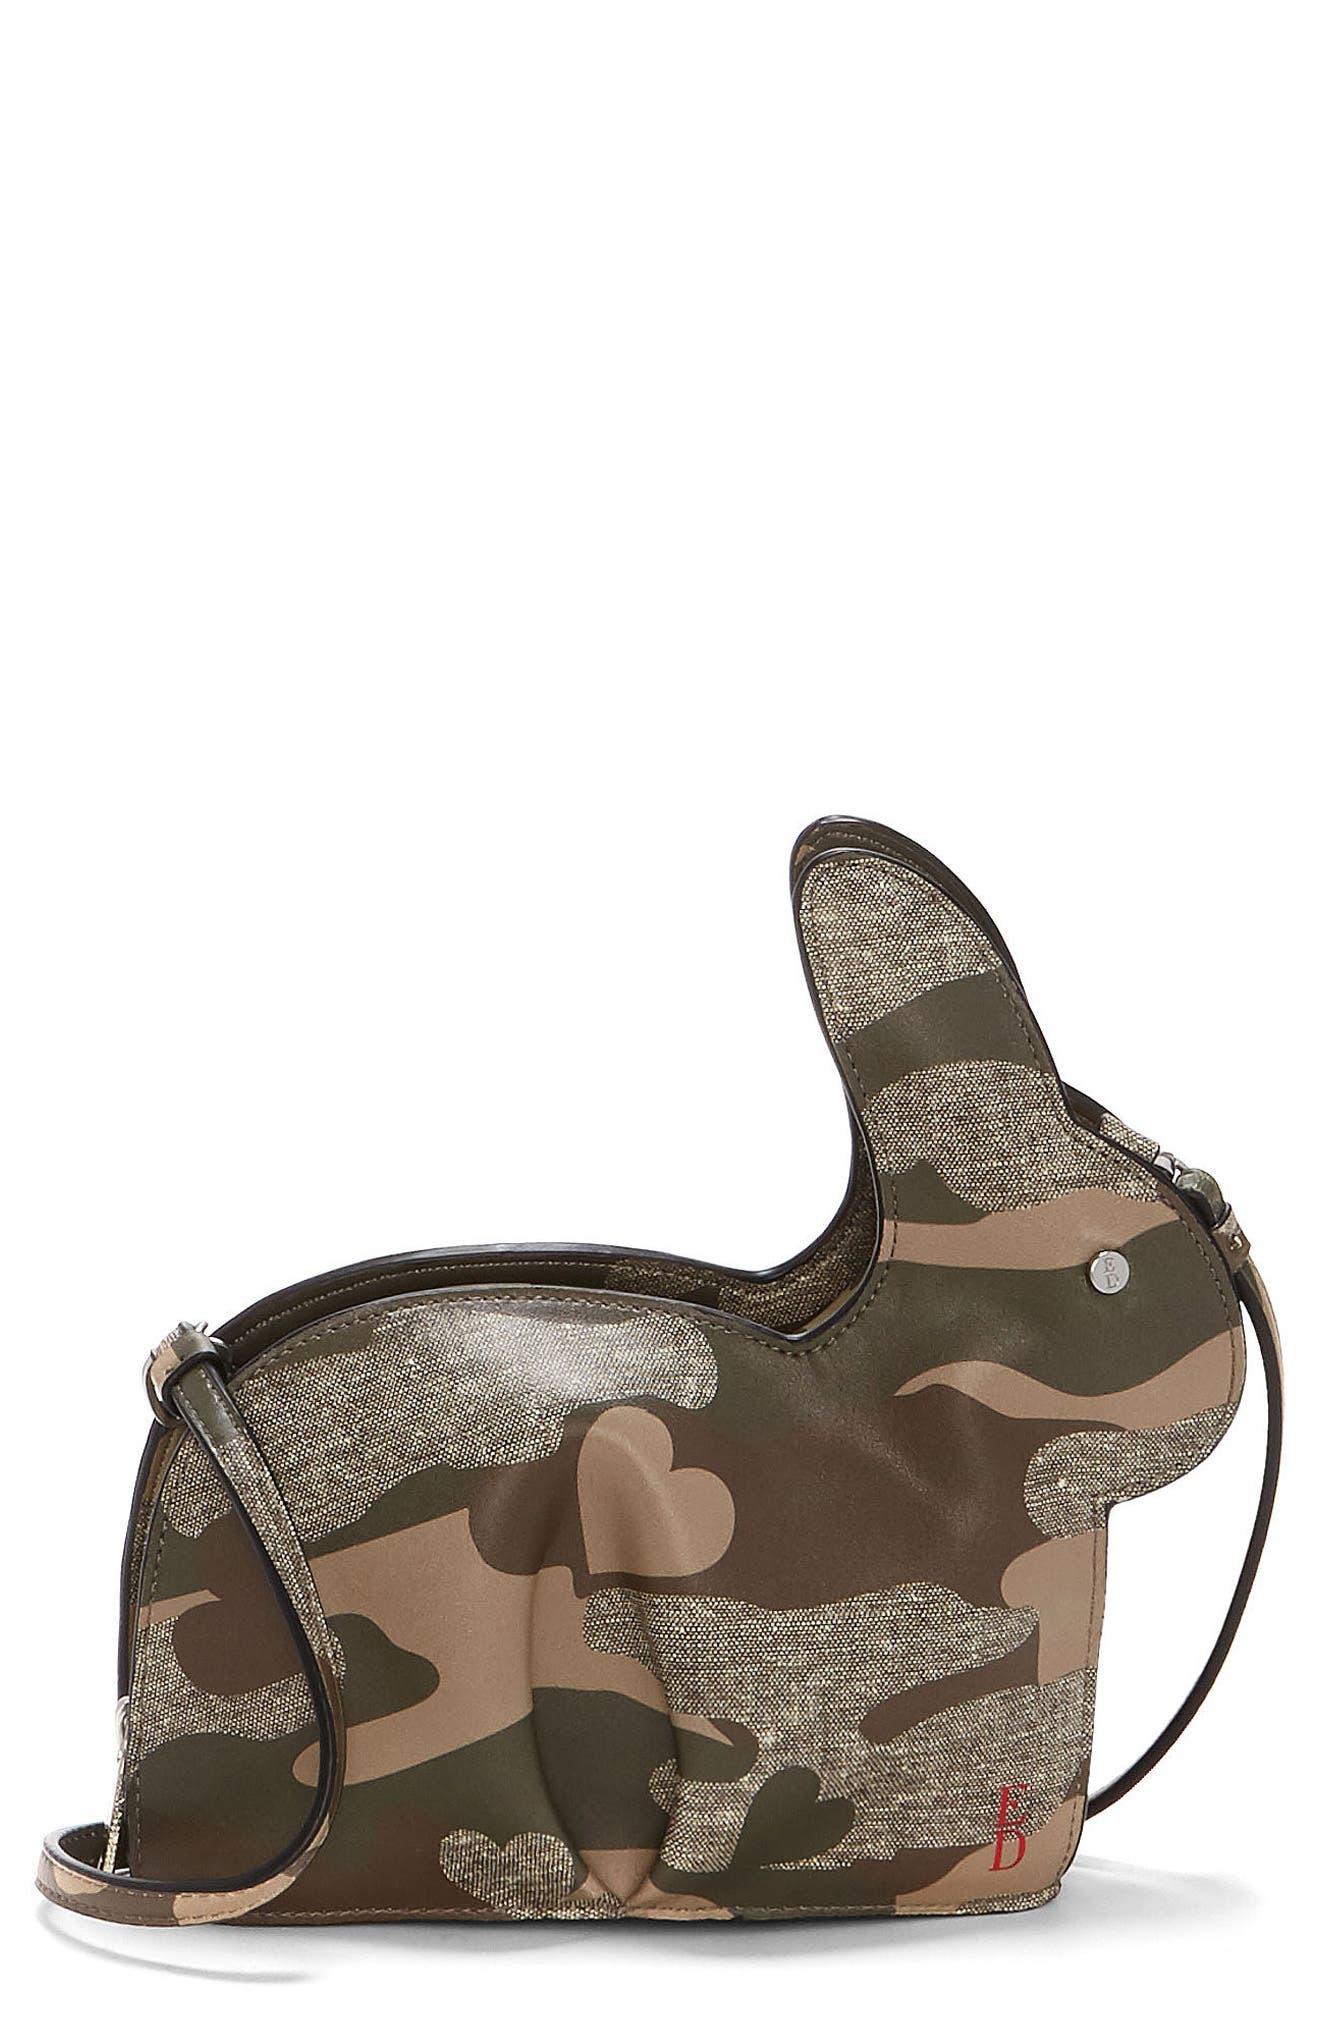 Carot Faux Leather Crossbody Bag,                             Main thumbnail 1, color,                             300